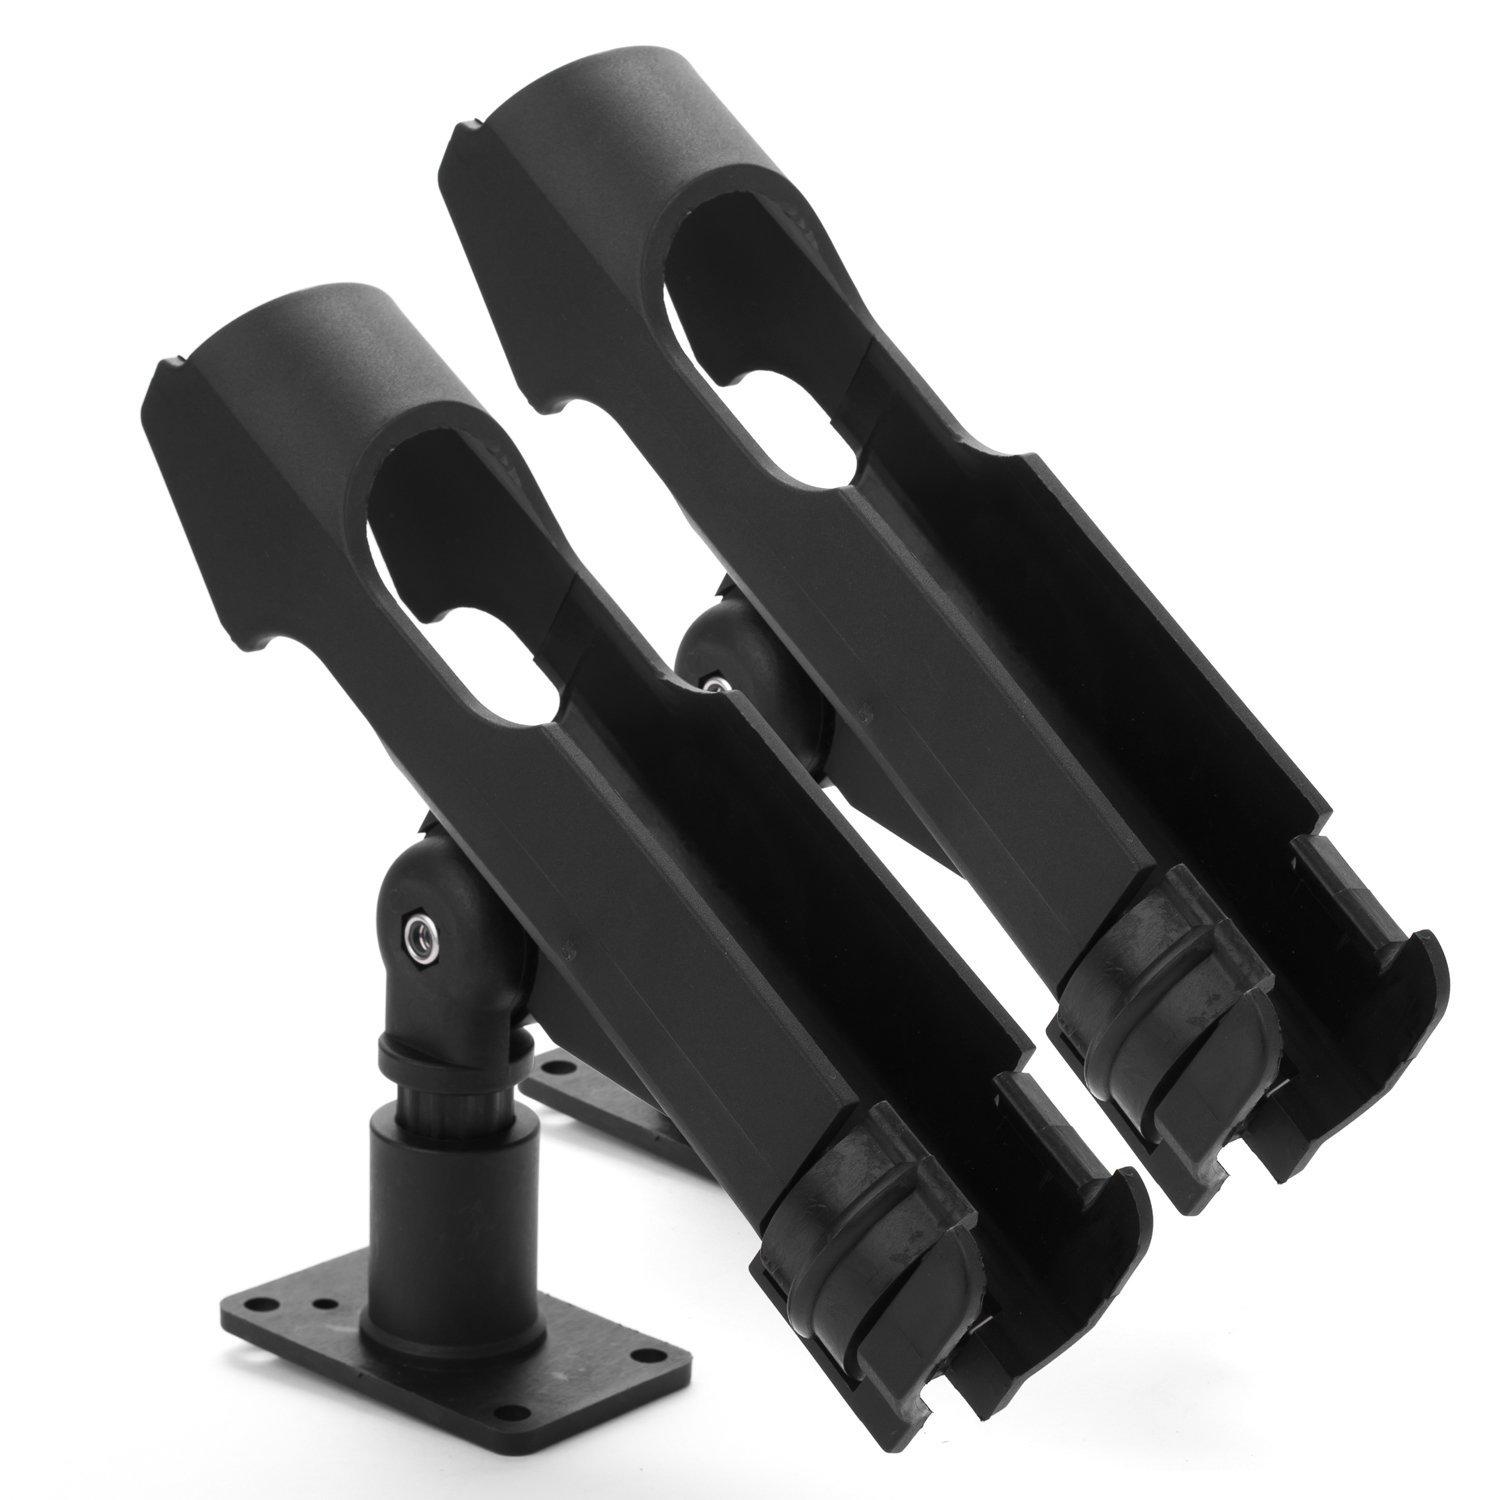 Bekith 2 Pack Adjustable Powerlock Rod Holder with Combo Mount, Black Finish by Bekith